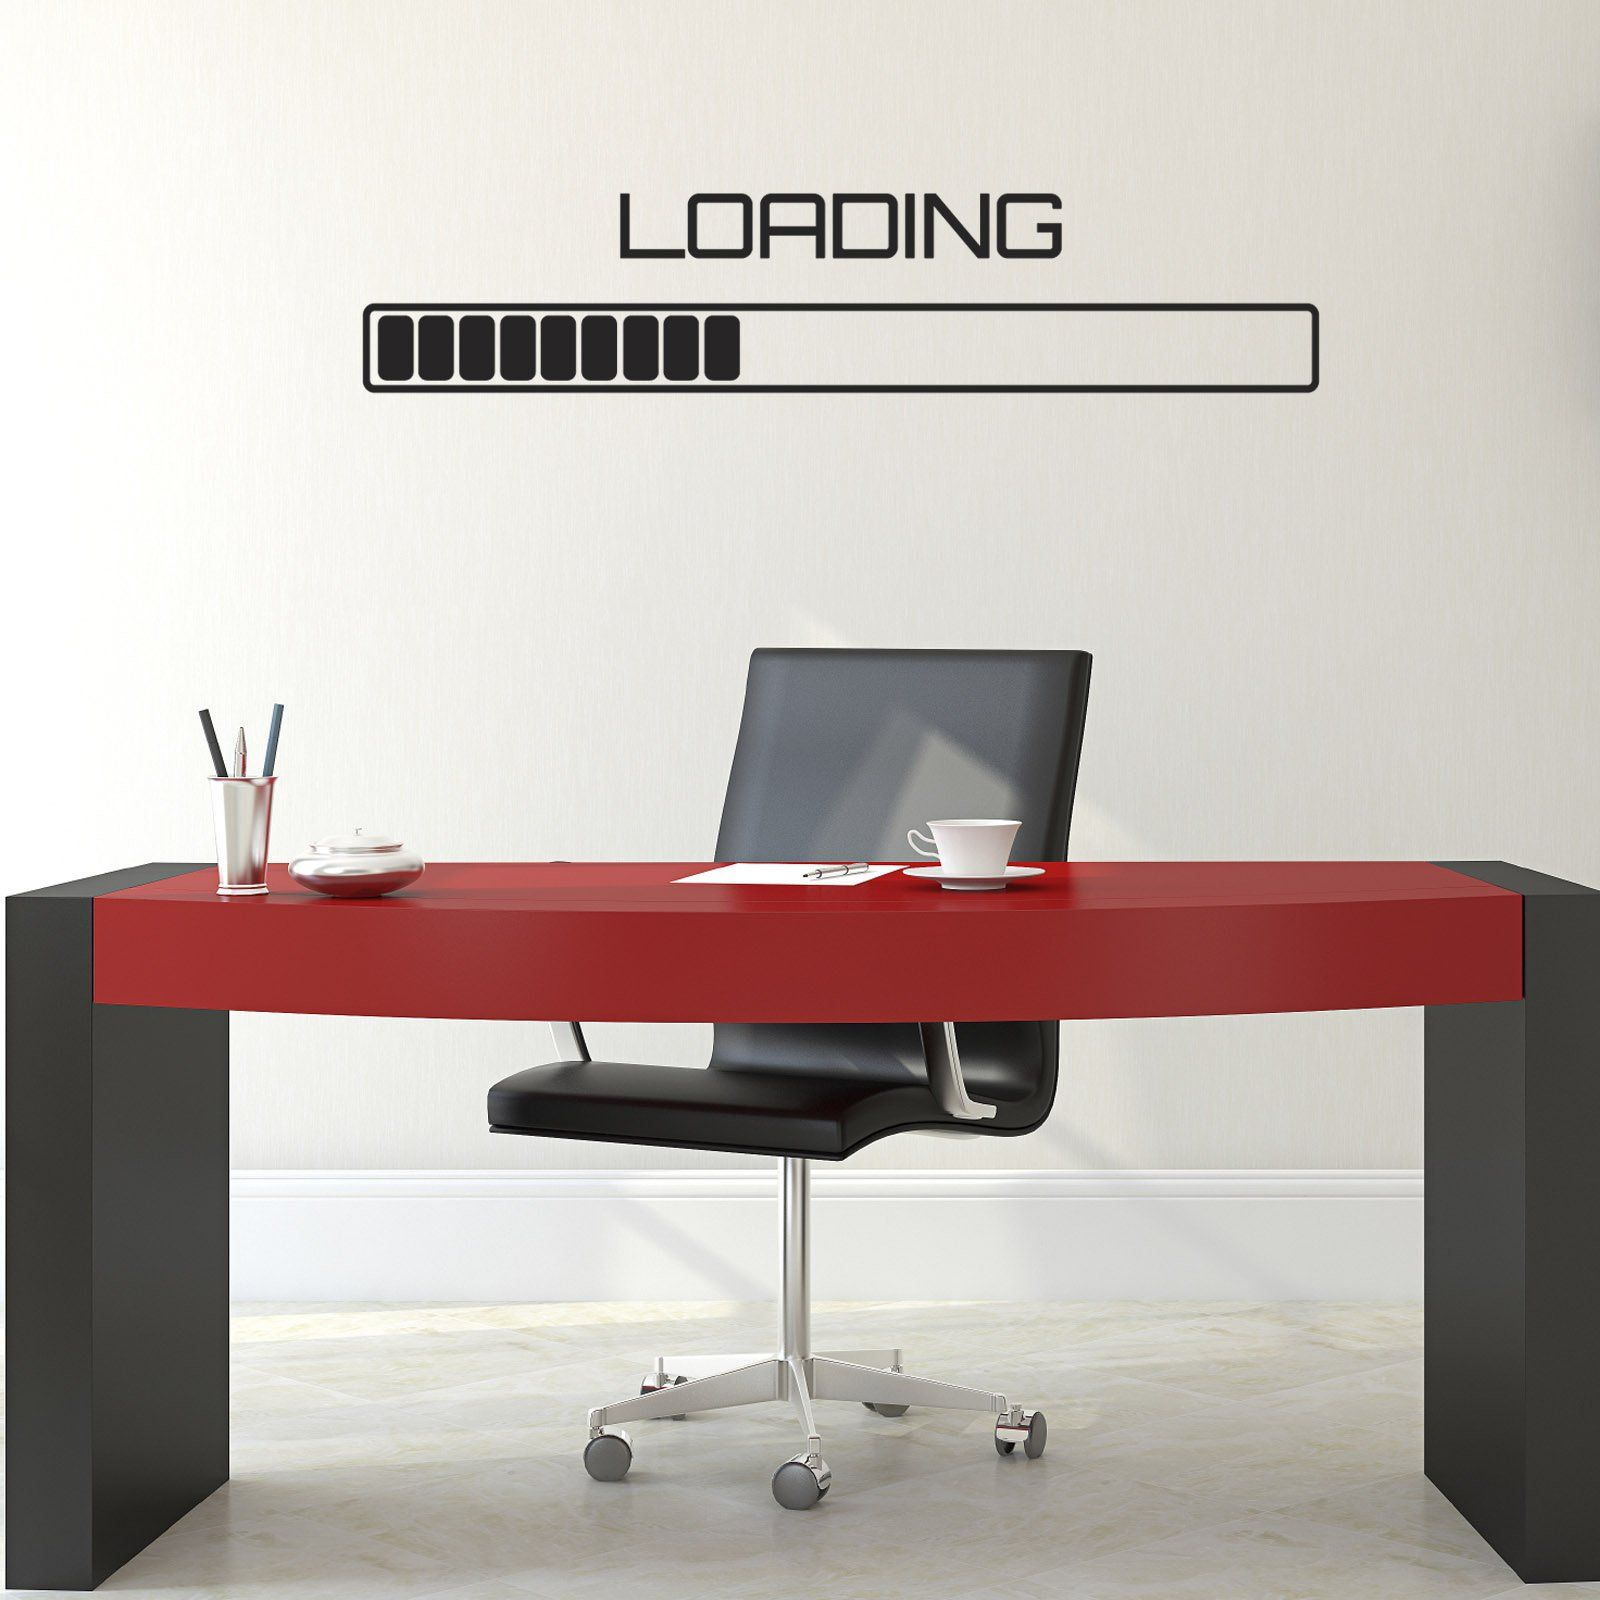 Loading Symbol Progress Bar Wall Decal  Gamer Computer Wall